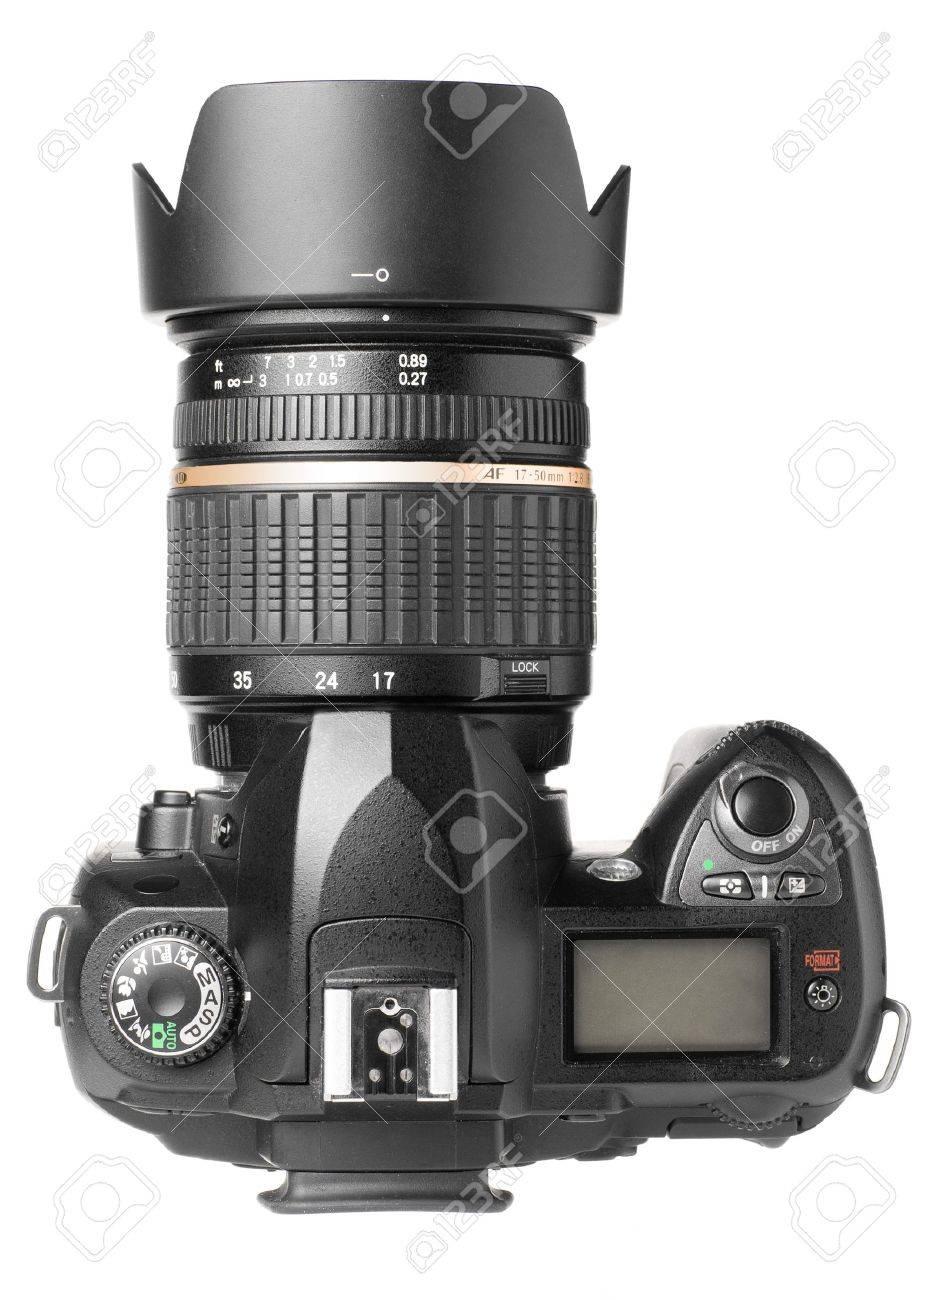 professional digital camera isolated on white Stock Photo - 8856943